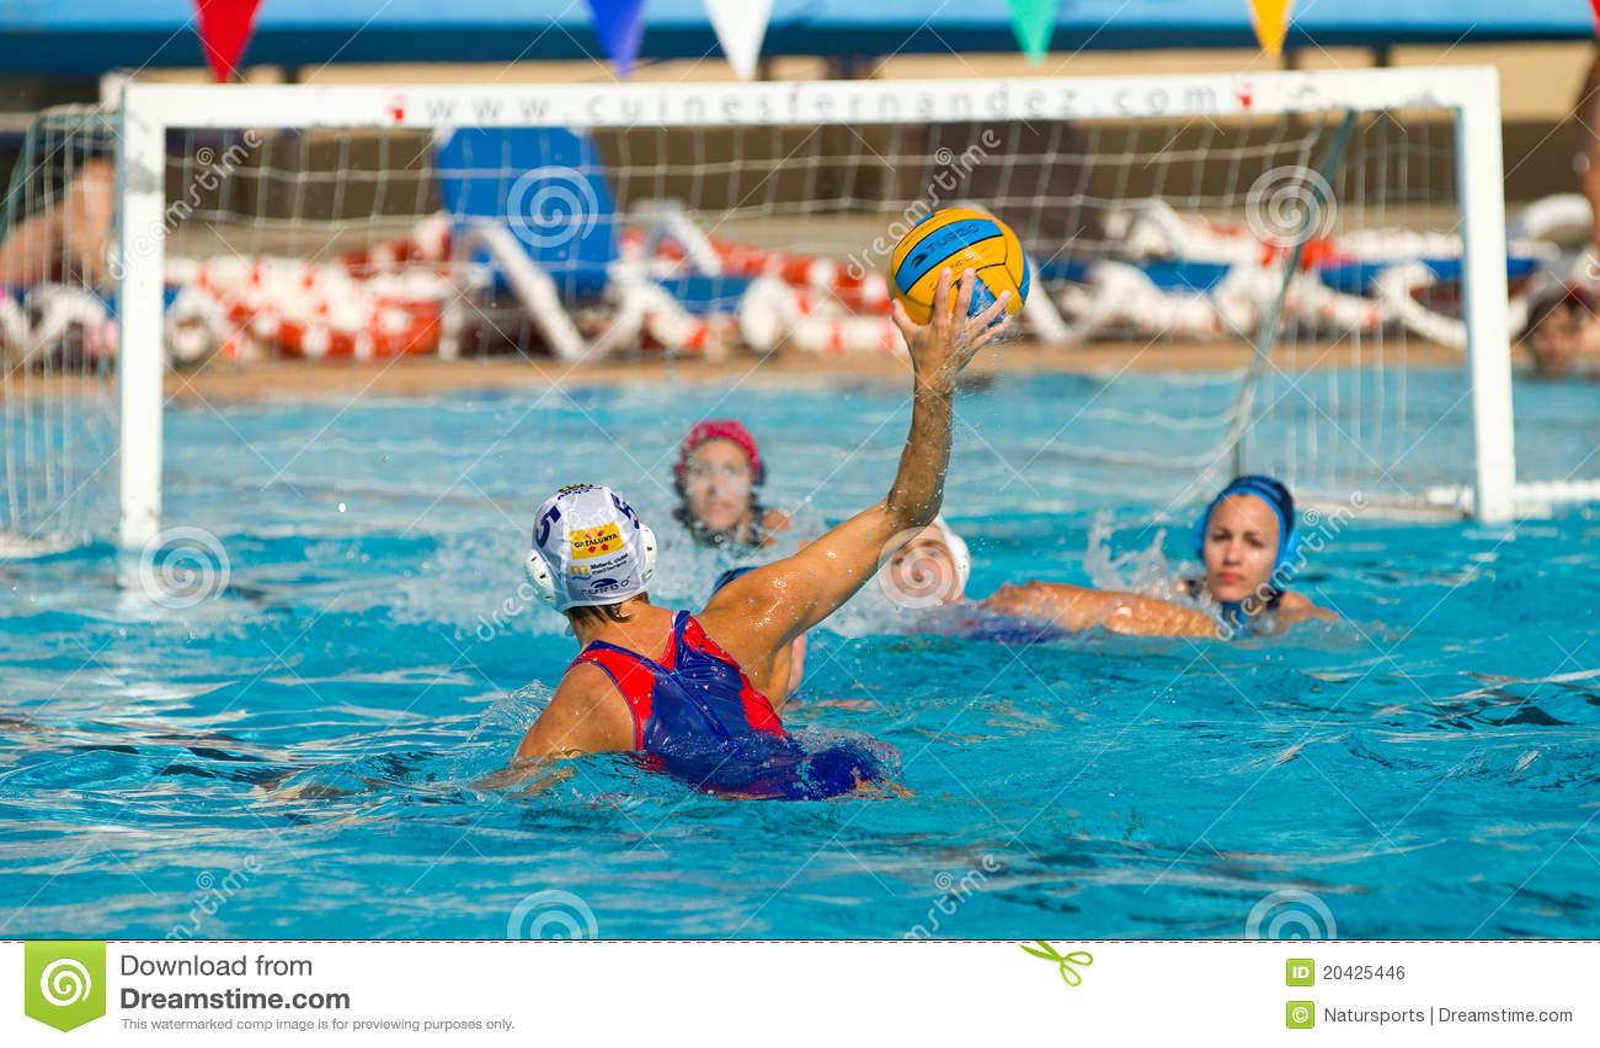 Water polo players shooting